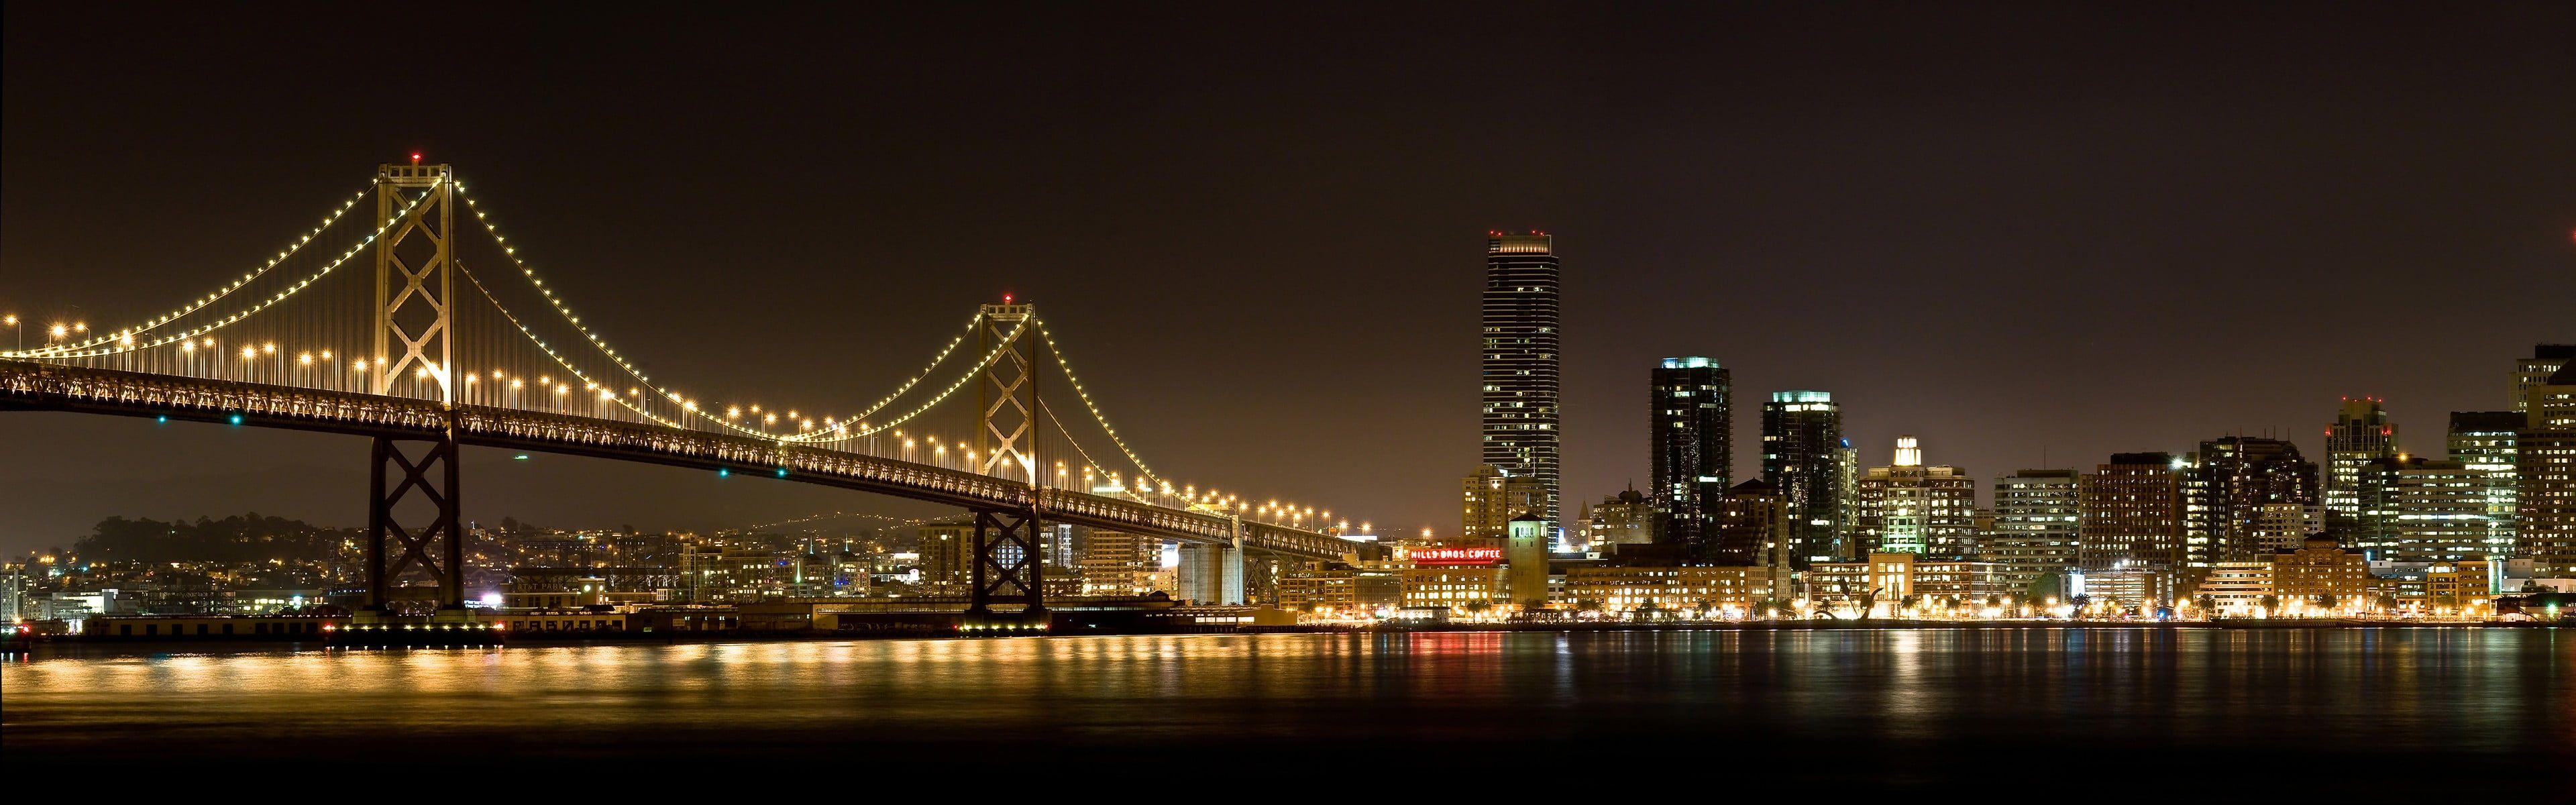 Brooklyn Bridge City Bridge Lights Night Reflection Multiple Display Dual Monitors 4k Wallpaper Hdwallpaper Deskt Brooklyn Bridge Bridge City Brooklyn